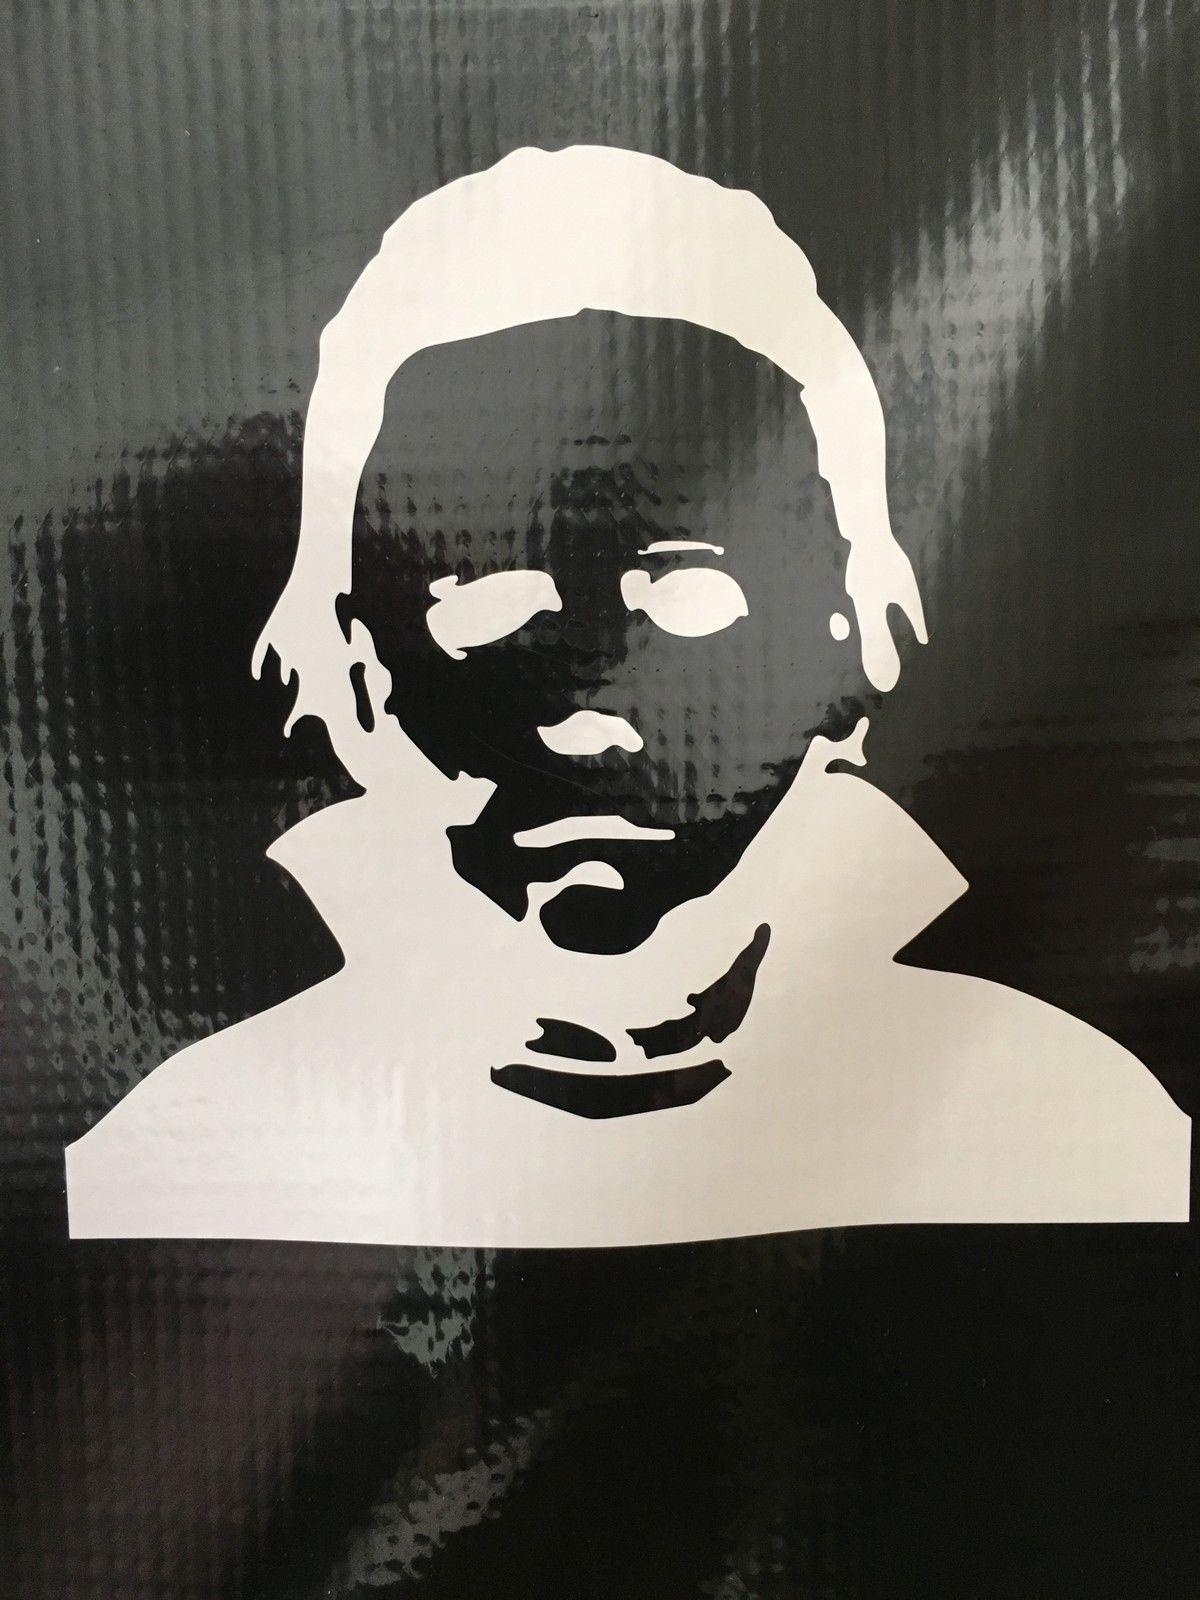 Michael Myers Halloween Horror Decal Sticker Vinyl Wall Laptop Car 4 5 Michael Myers Halloween Michael Myers Drawing Michael Myers [ 1600 x 1200 Pixel ]